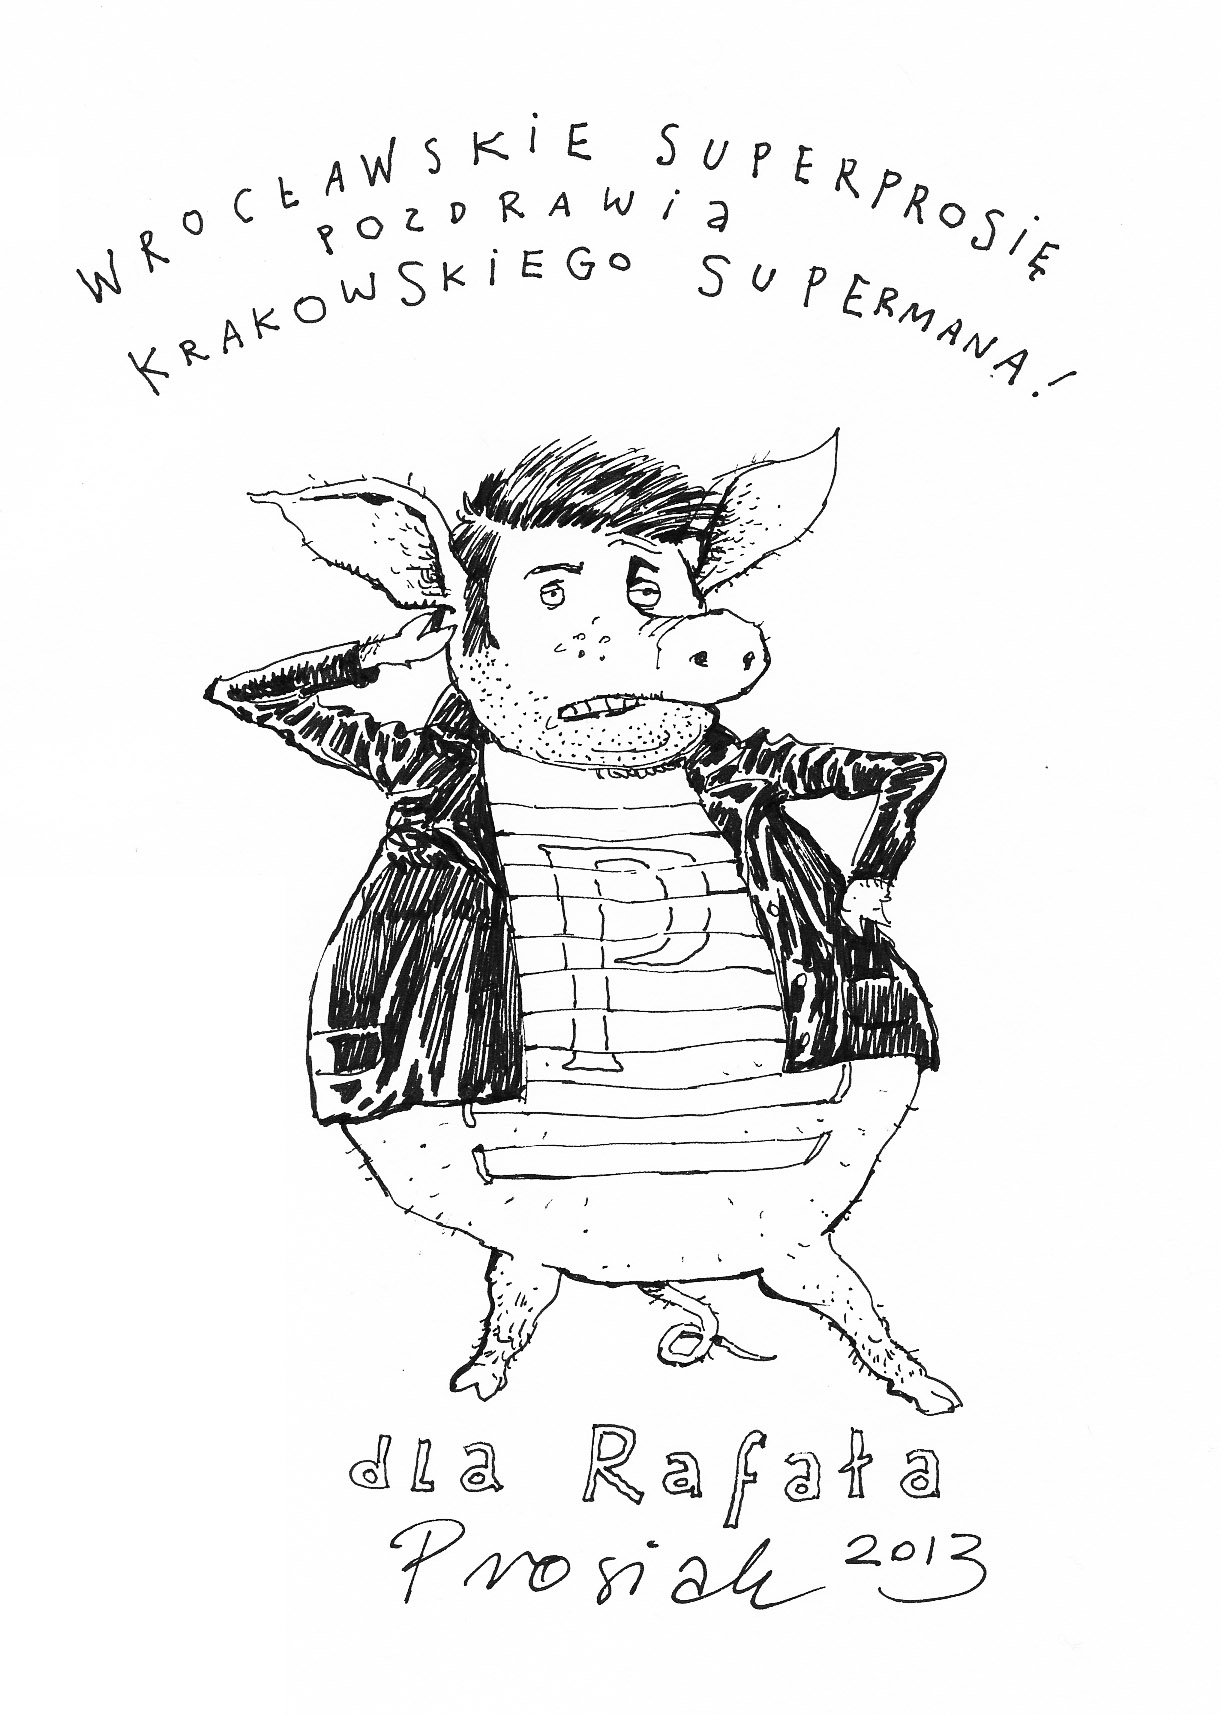 32.BLER - Krzystof Owedyk Prosiak